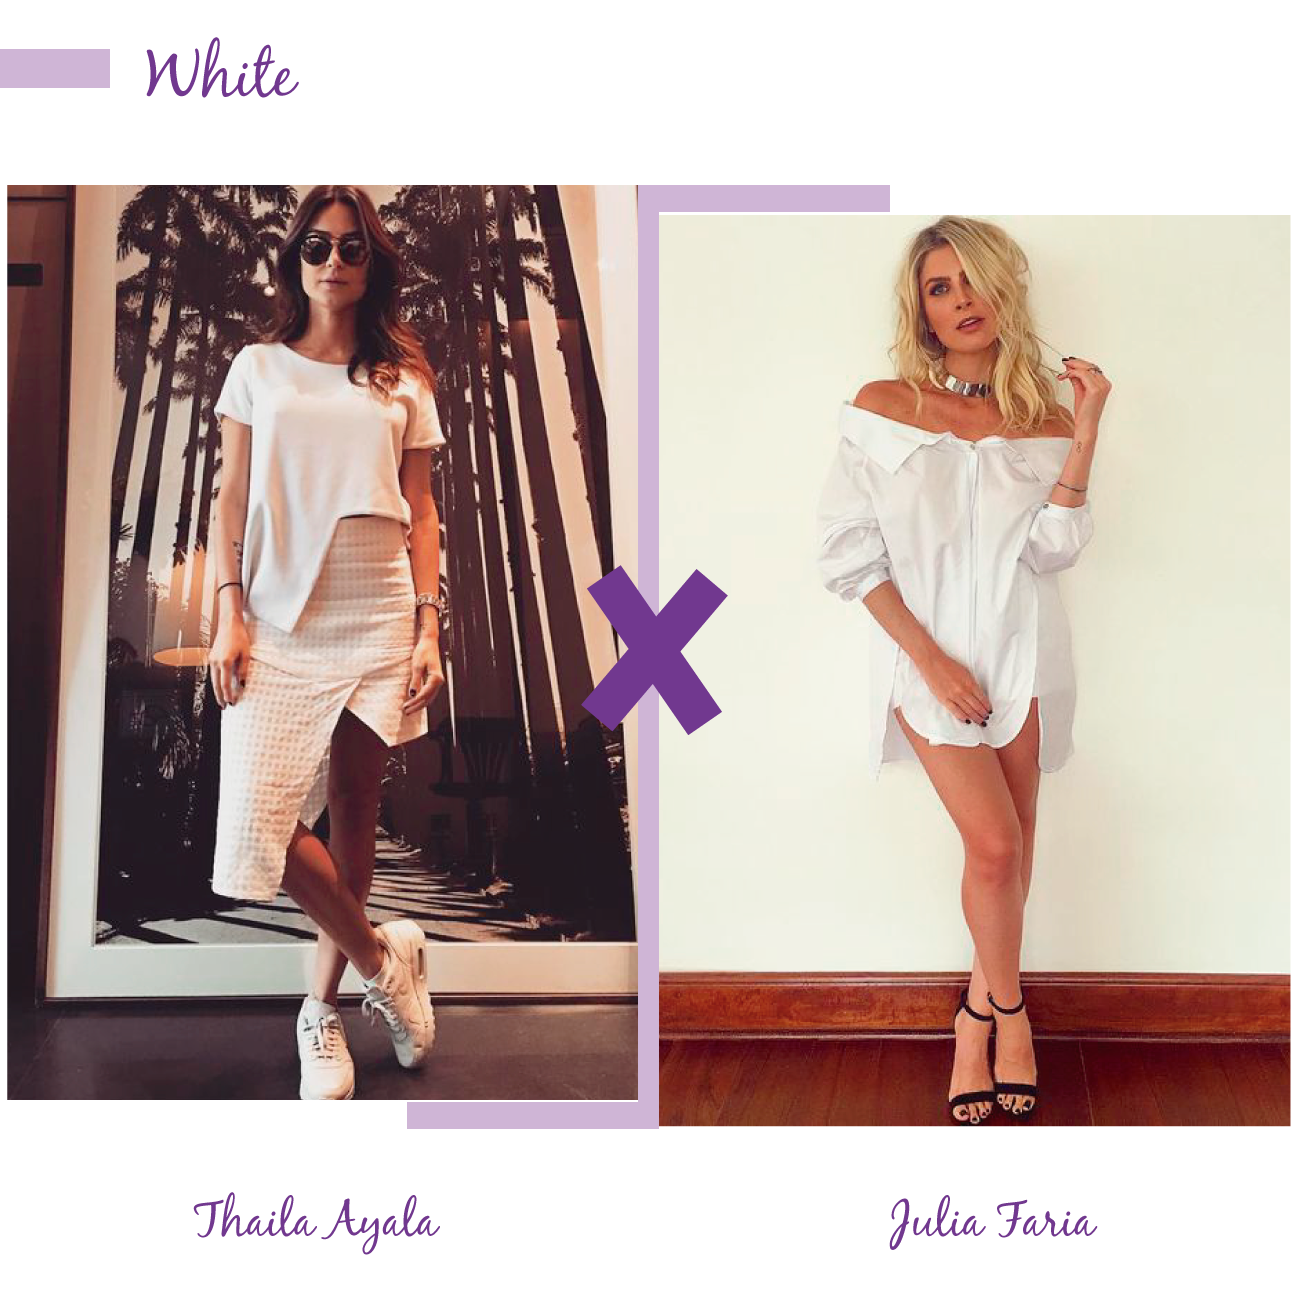 thaila ayala e julia faria look branco